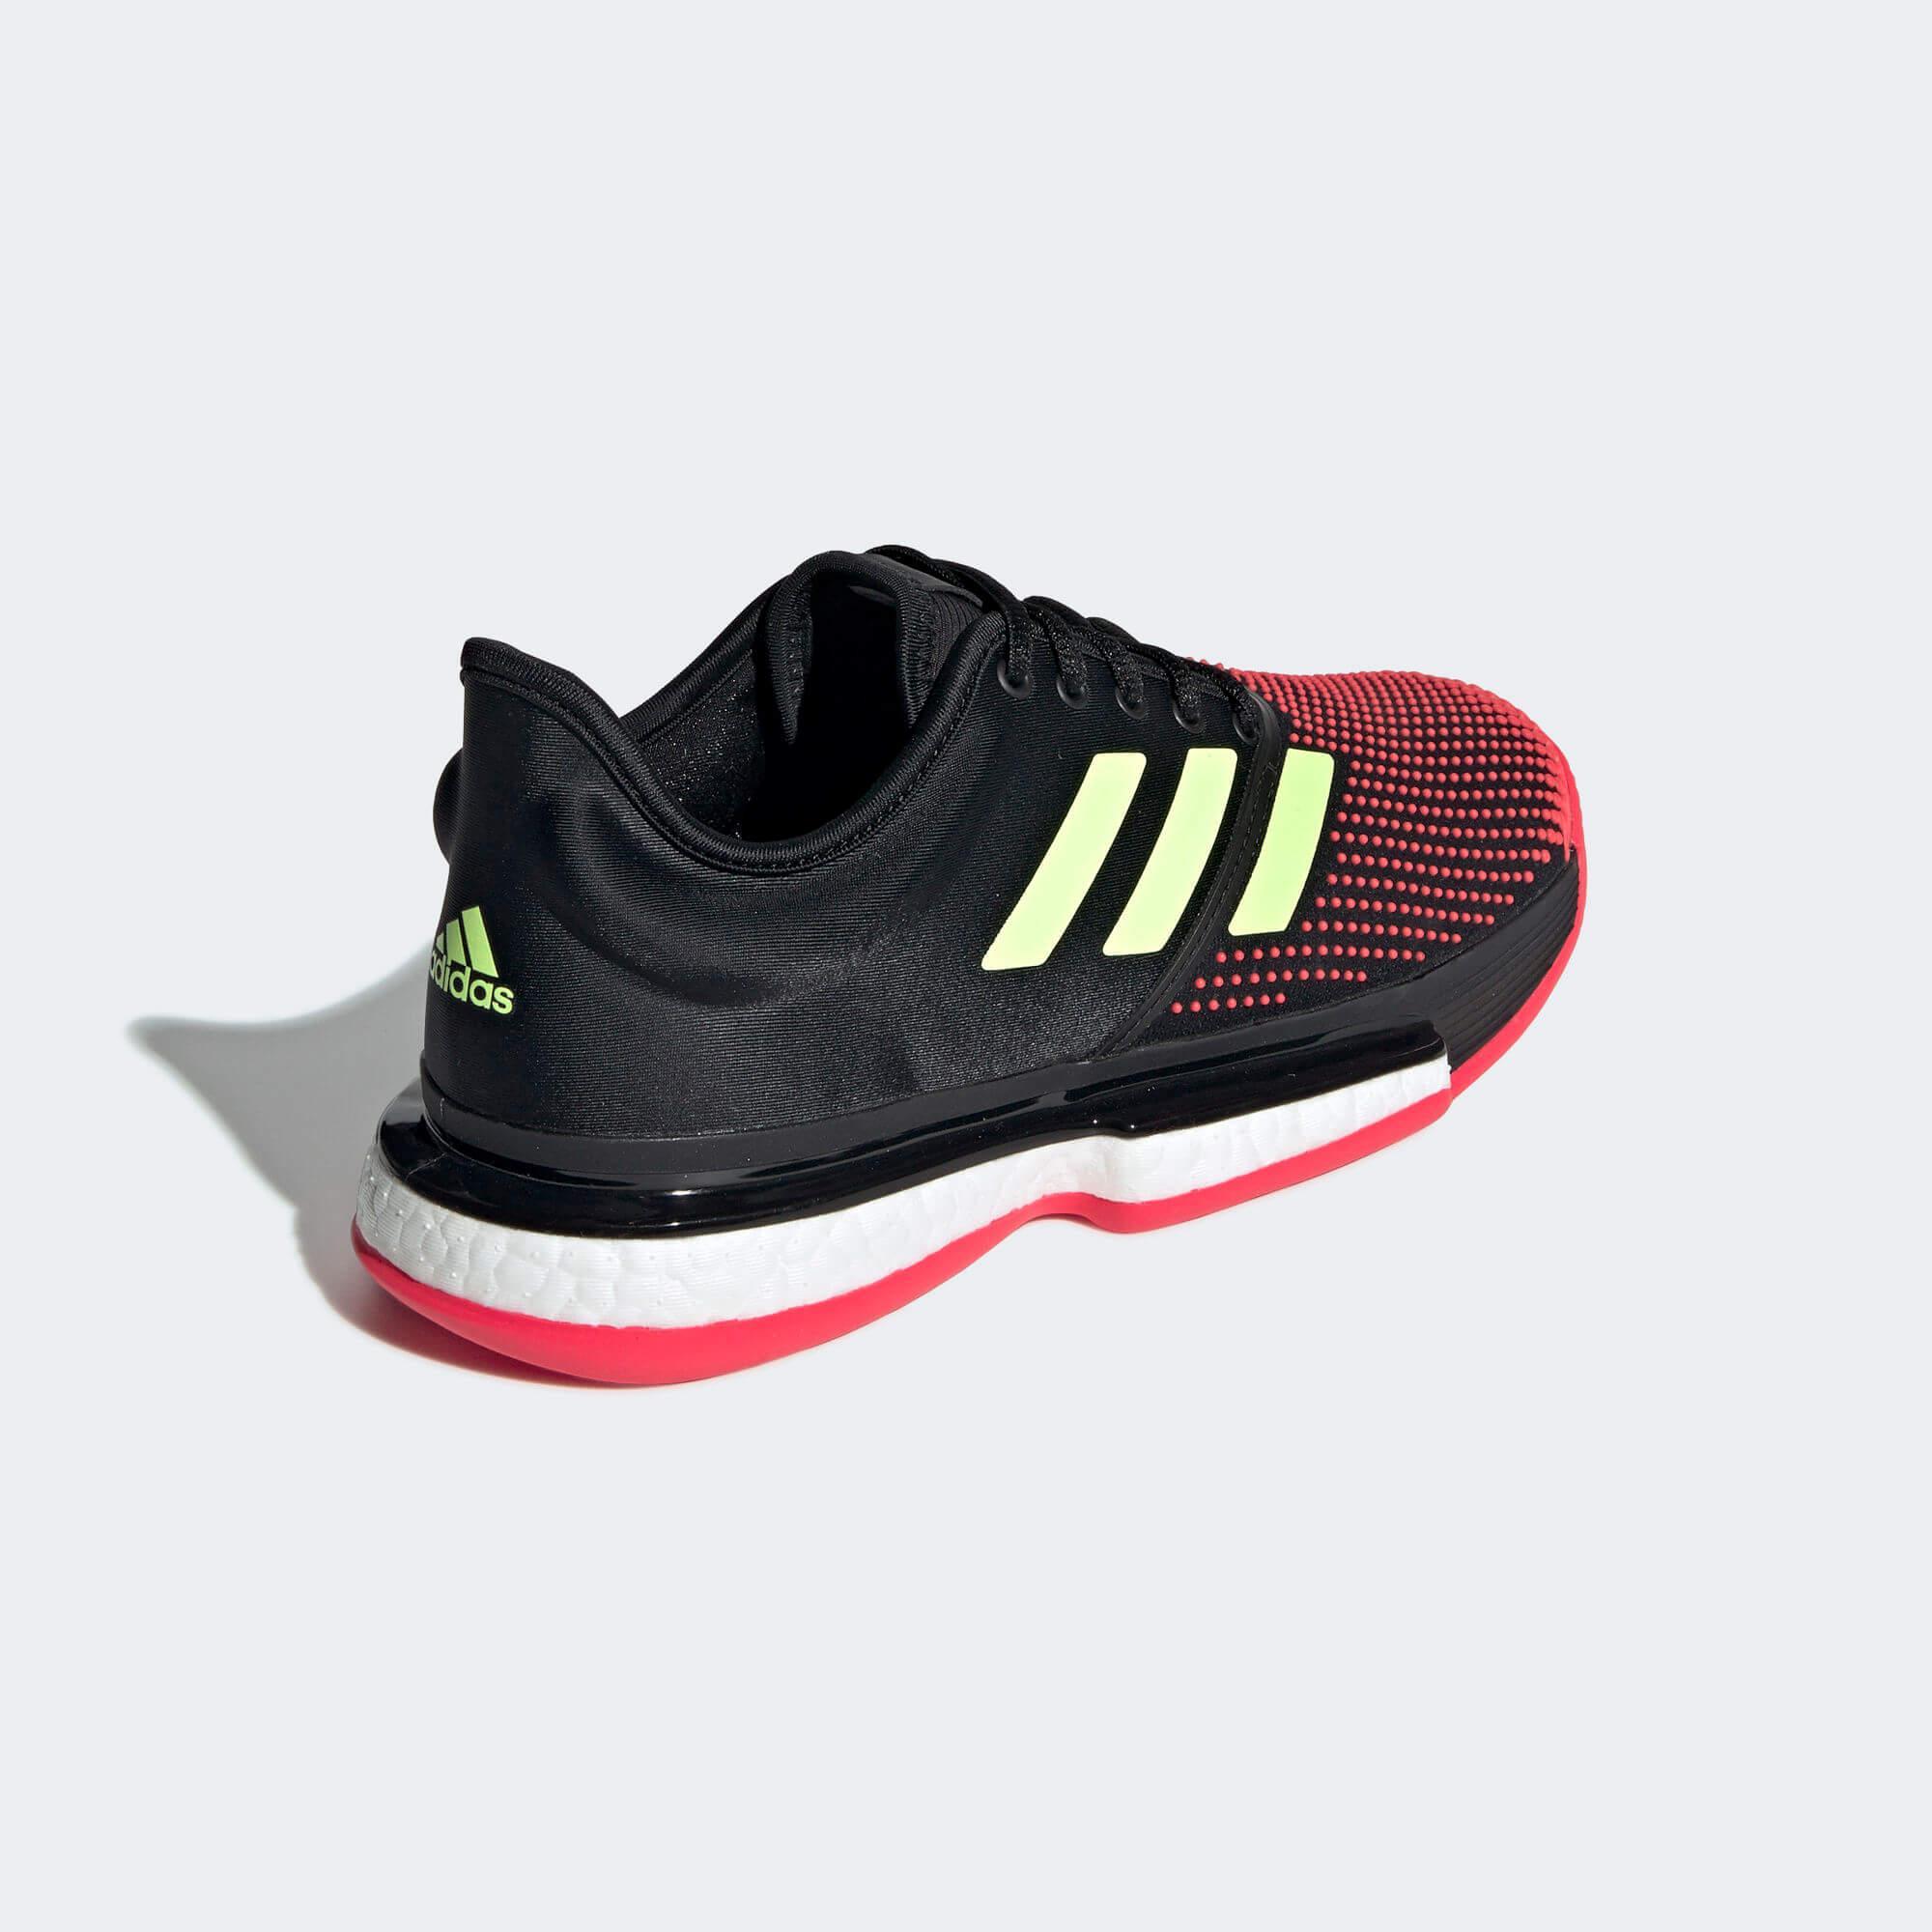 35620d9ba99c Adidas Womens SoleCourt Boost Tennis Shoes - Black Shock Red ...